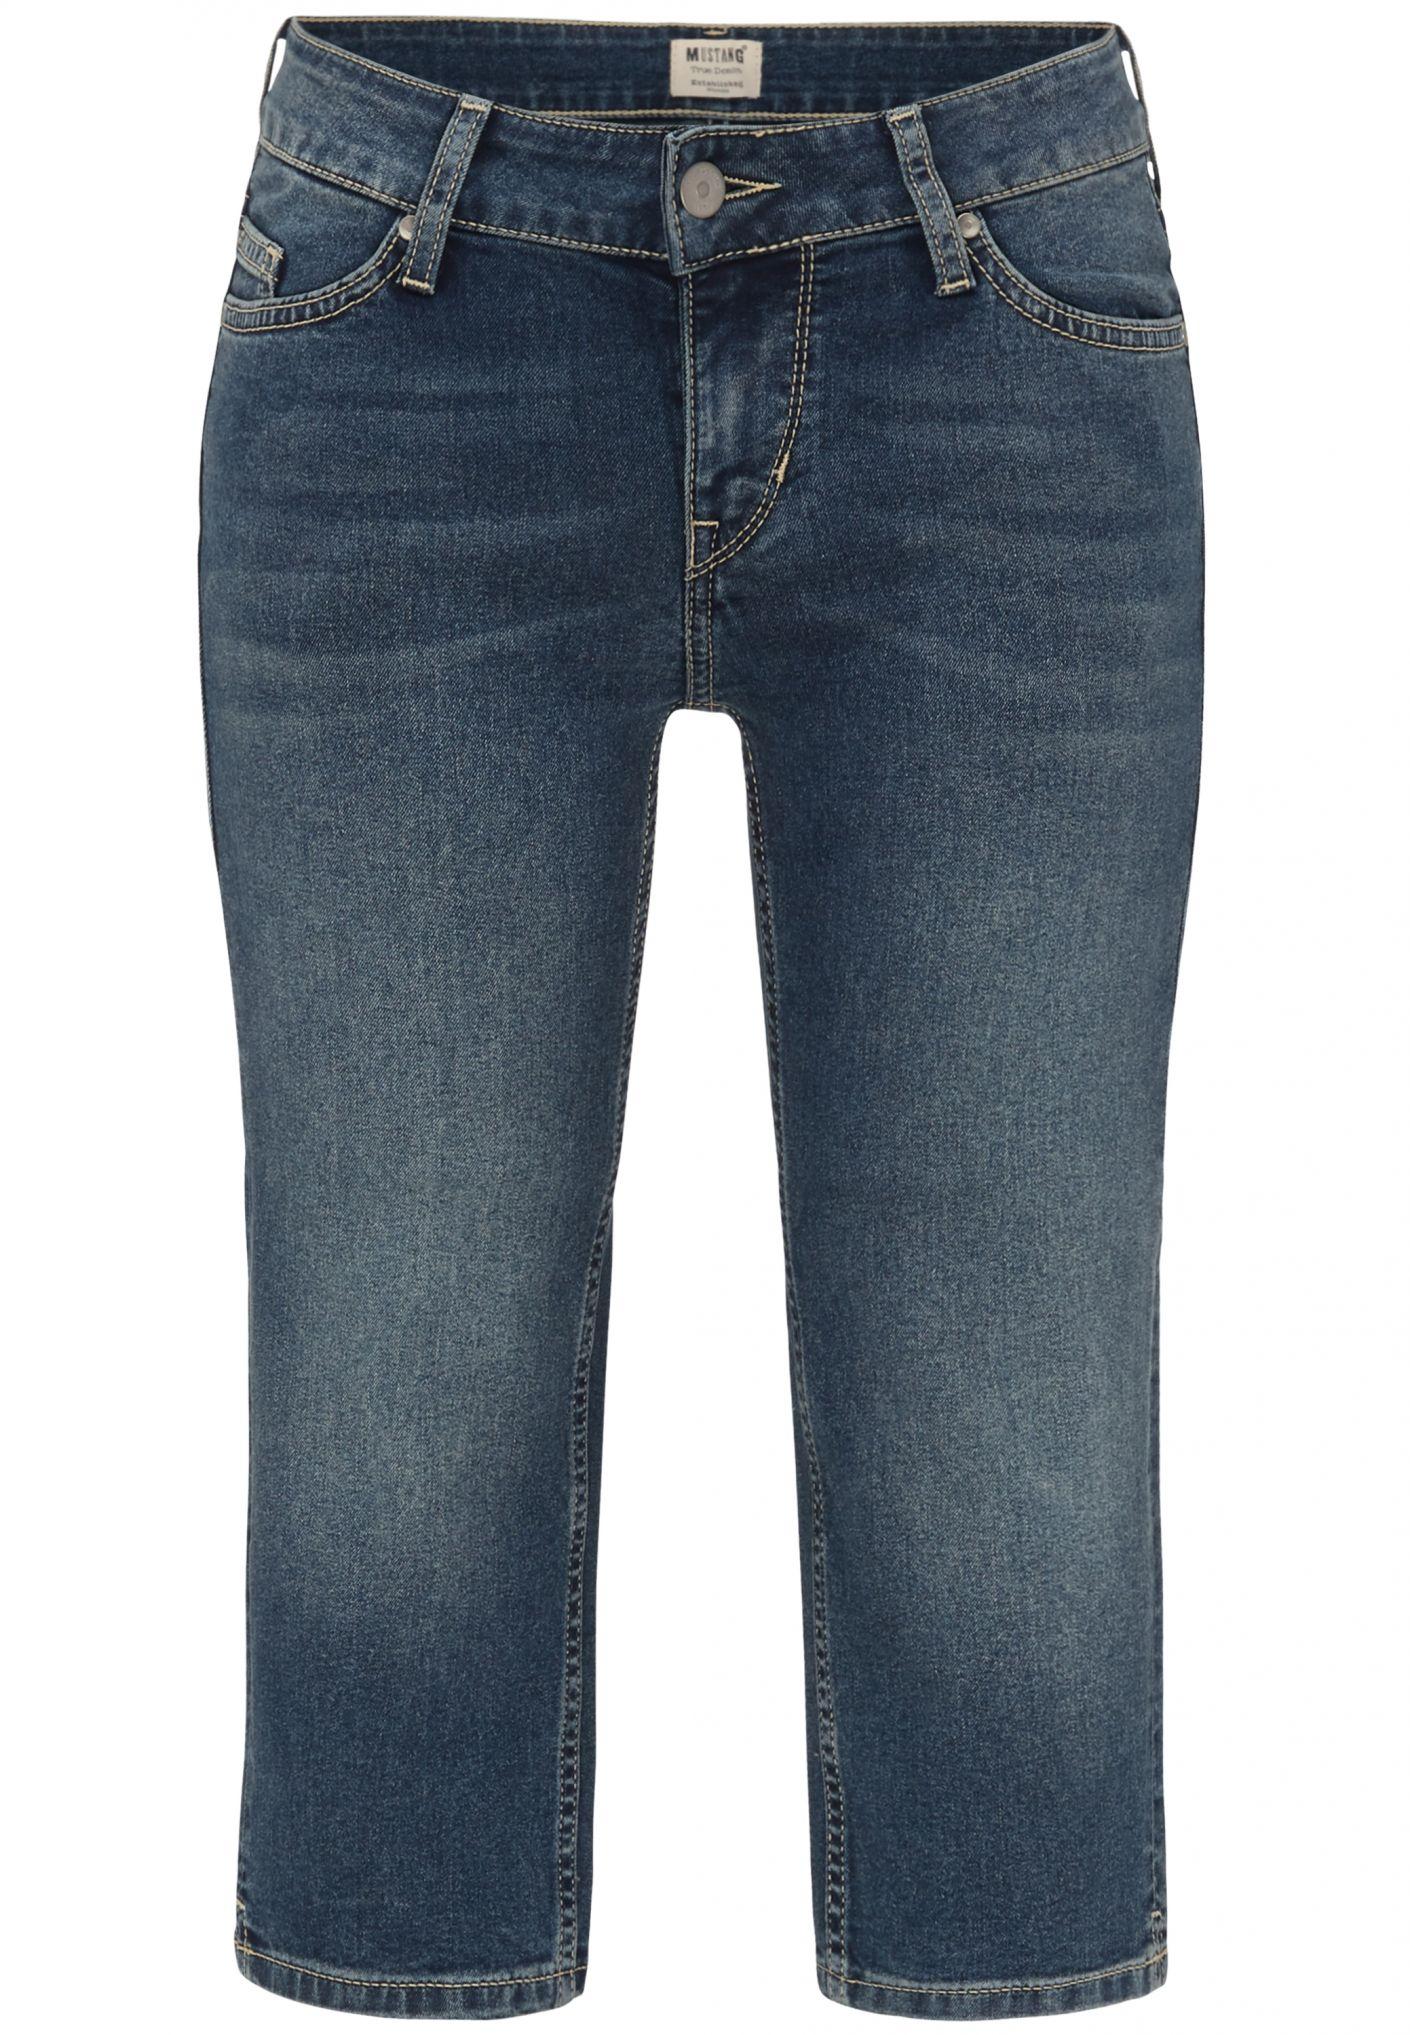 23895f56129a jeans.cz - Levi s®